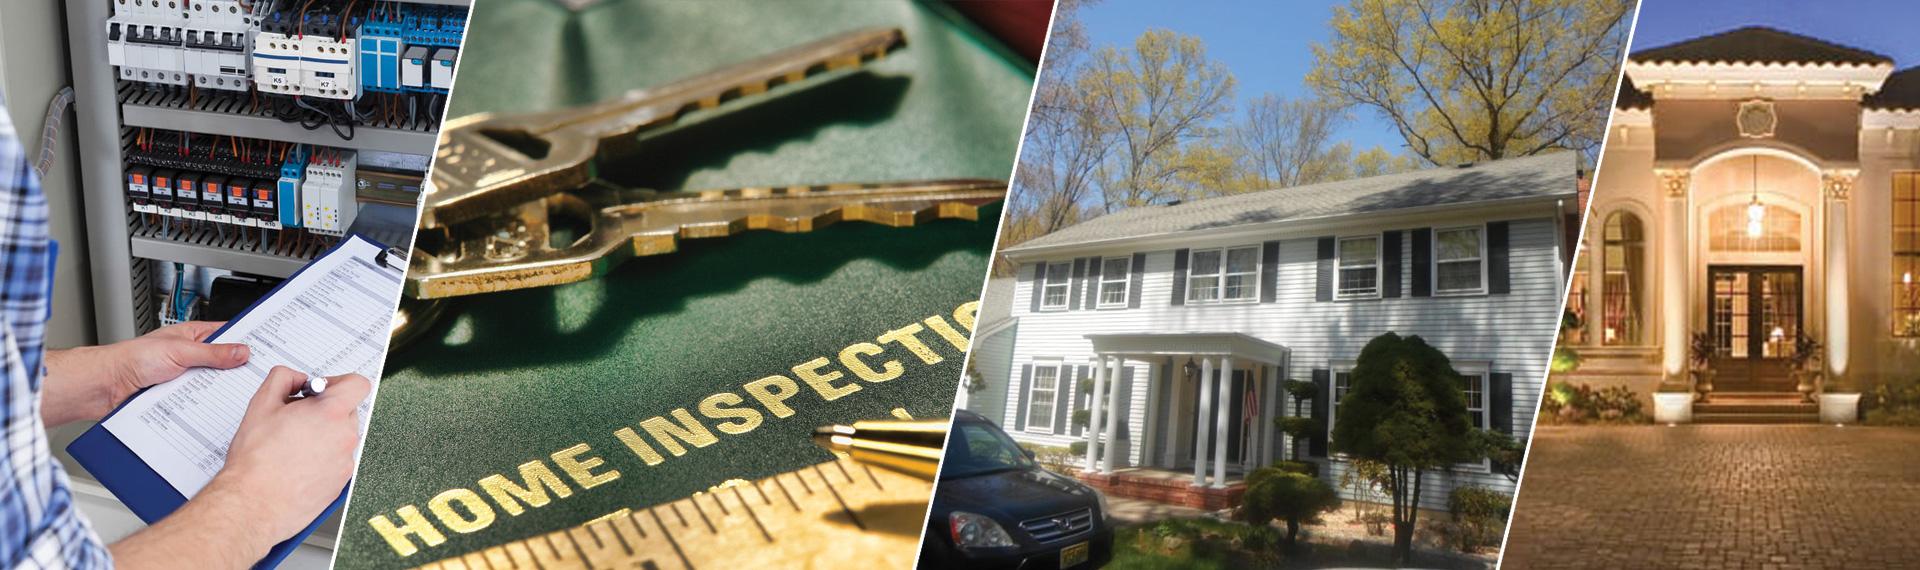 AAA House Doctors Engineers & Home Inspectors South Brunswick NJ